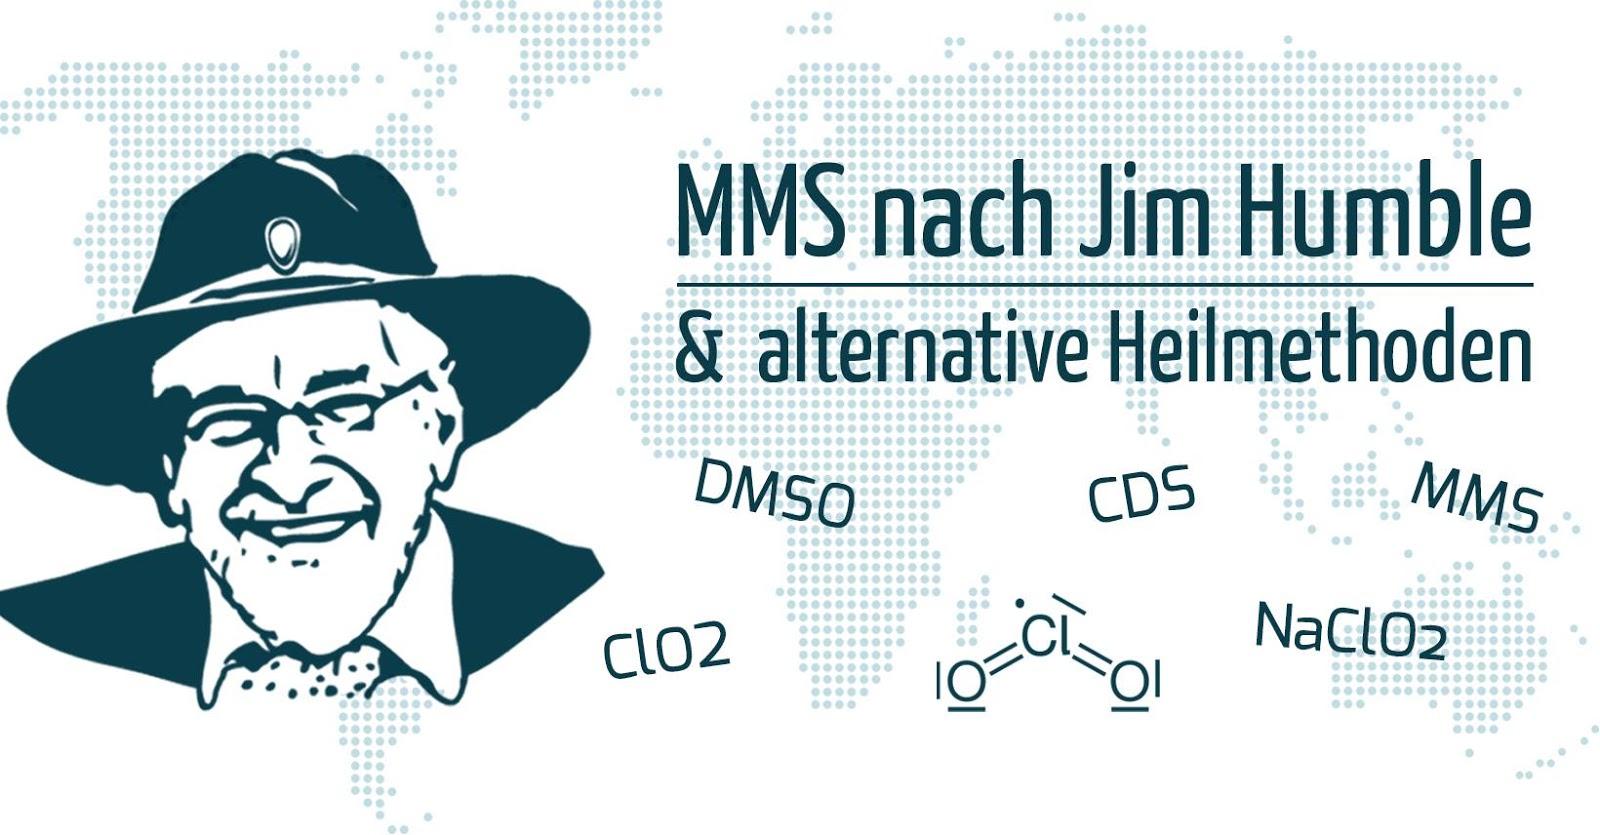 https://www.facebook.com/groups/mms.alternative.heilmethoden